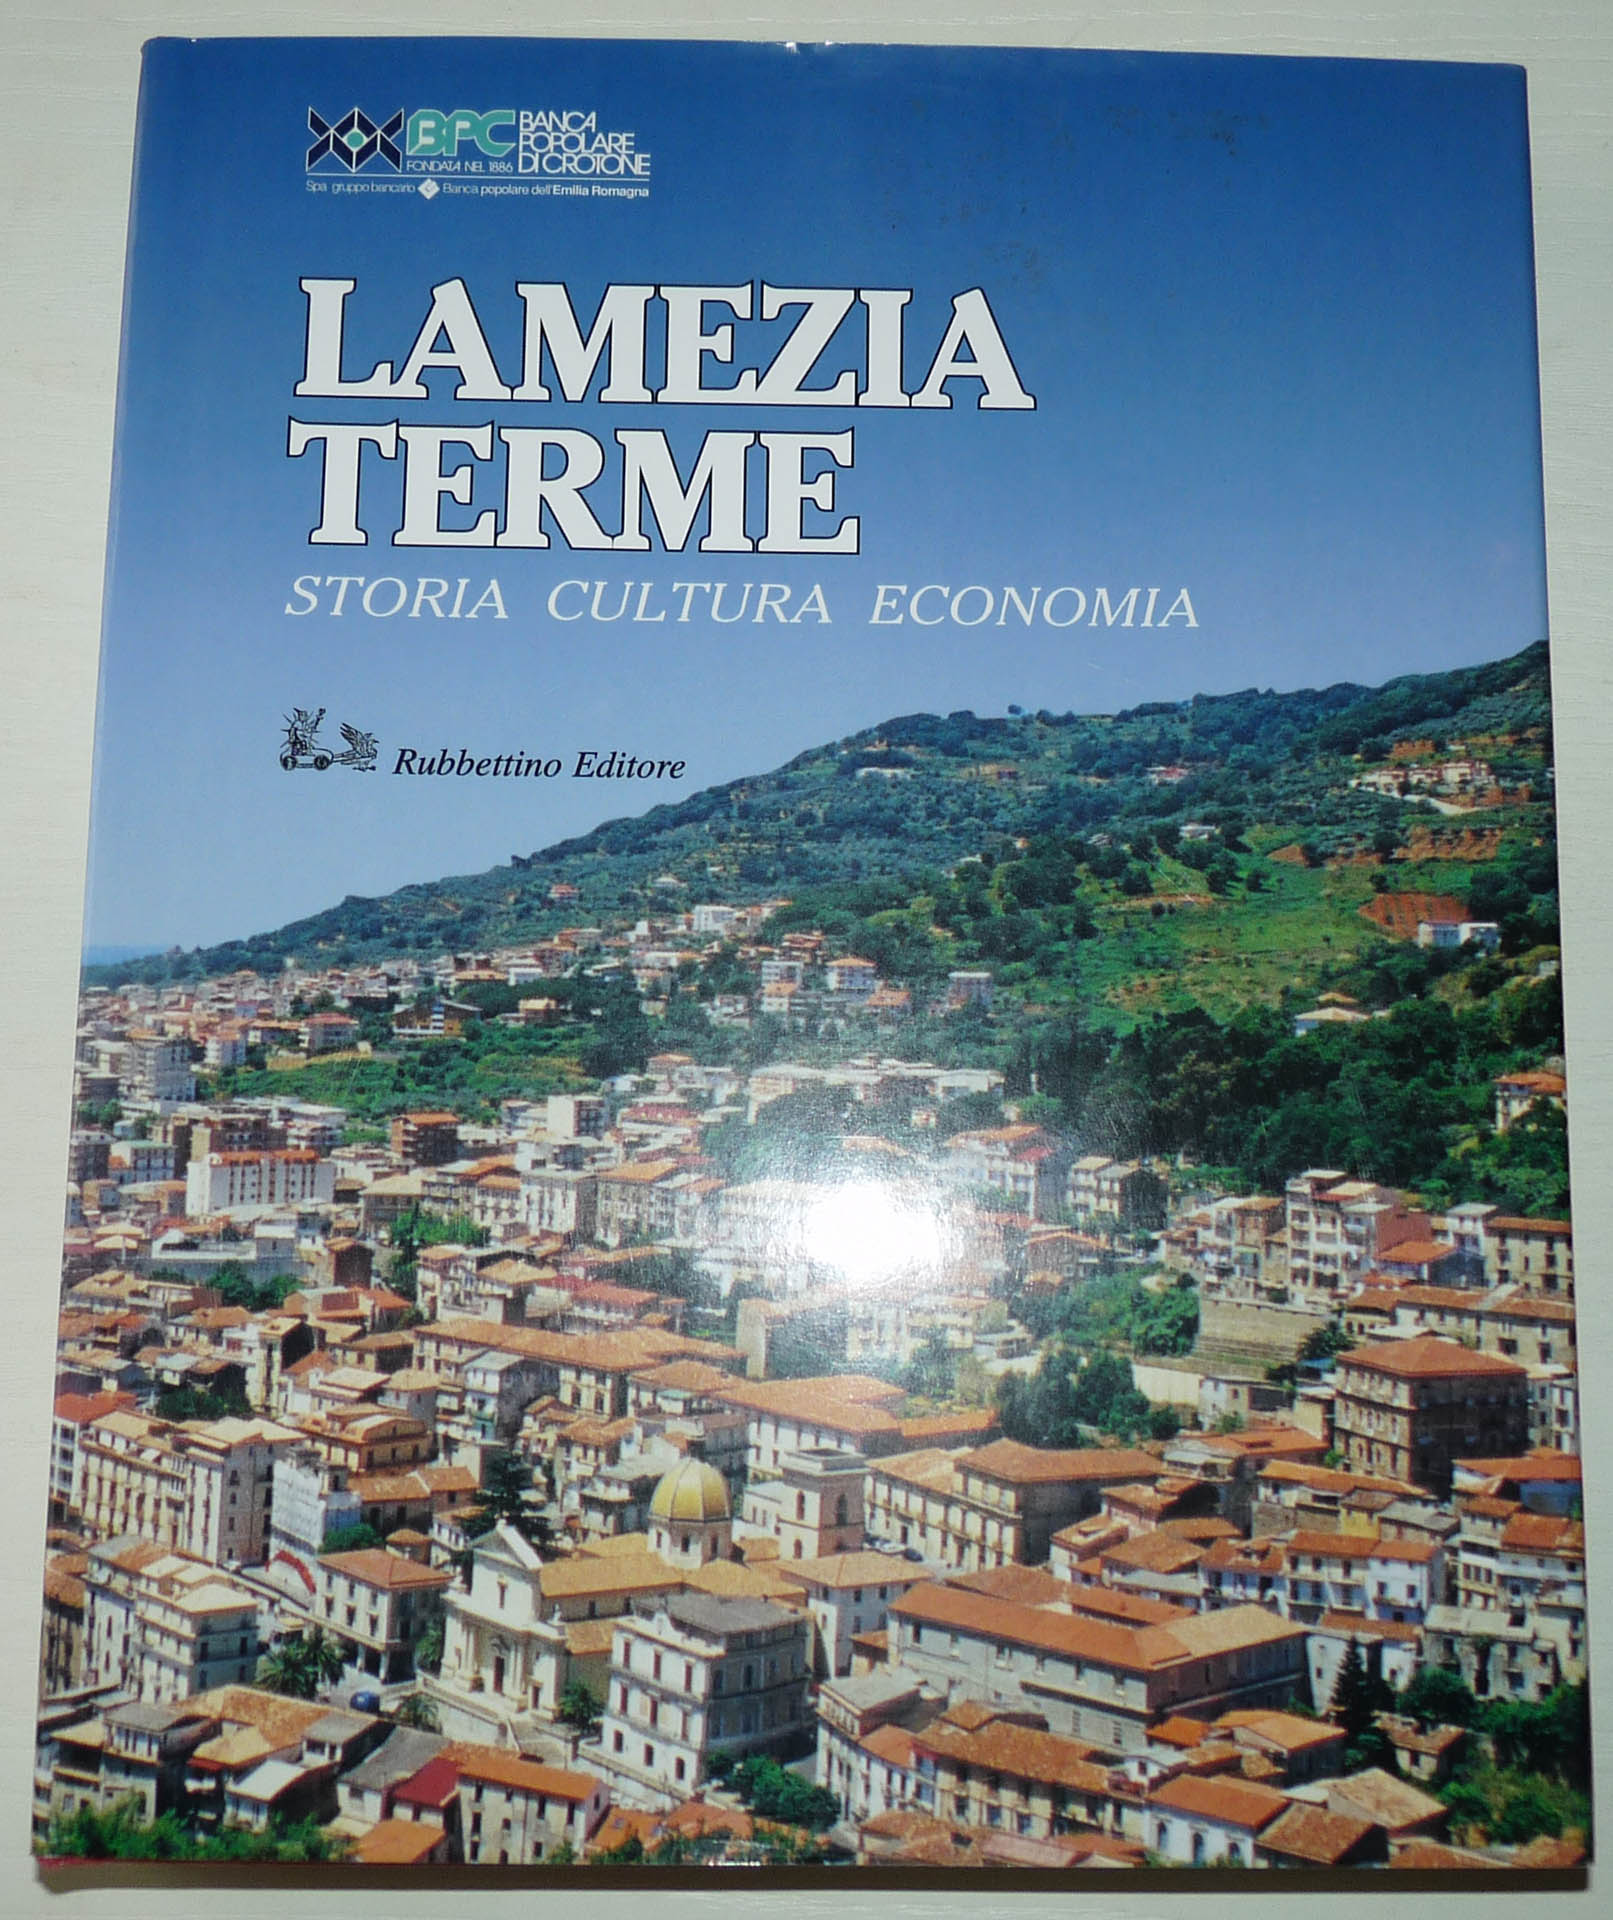 LAMEZIA TERME. Storia, cultura, economia.